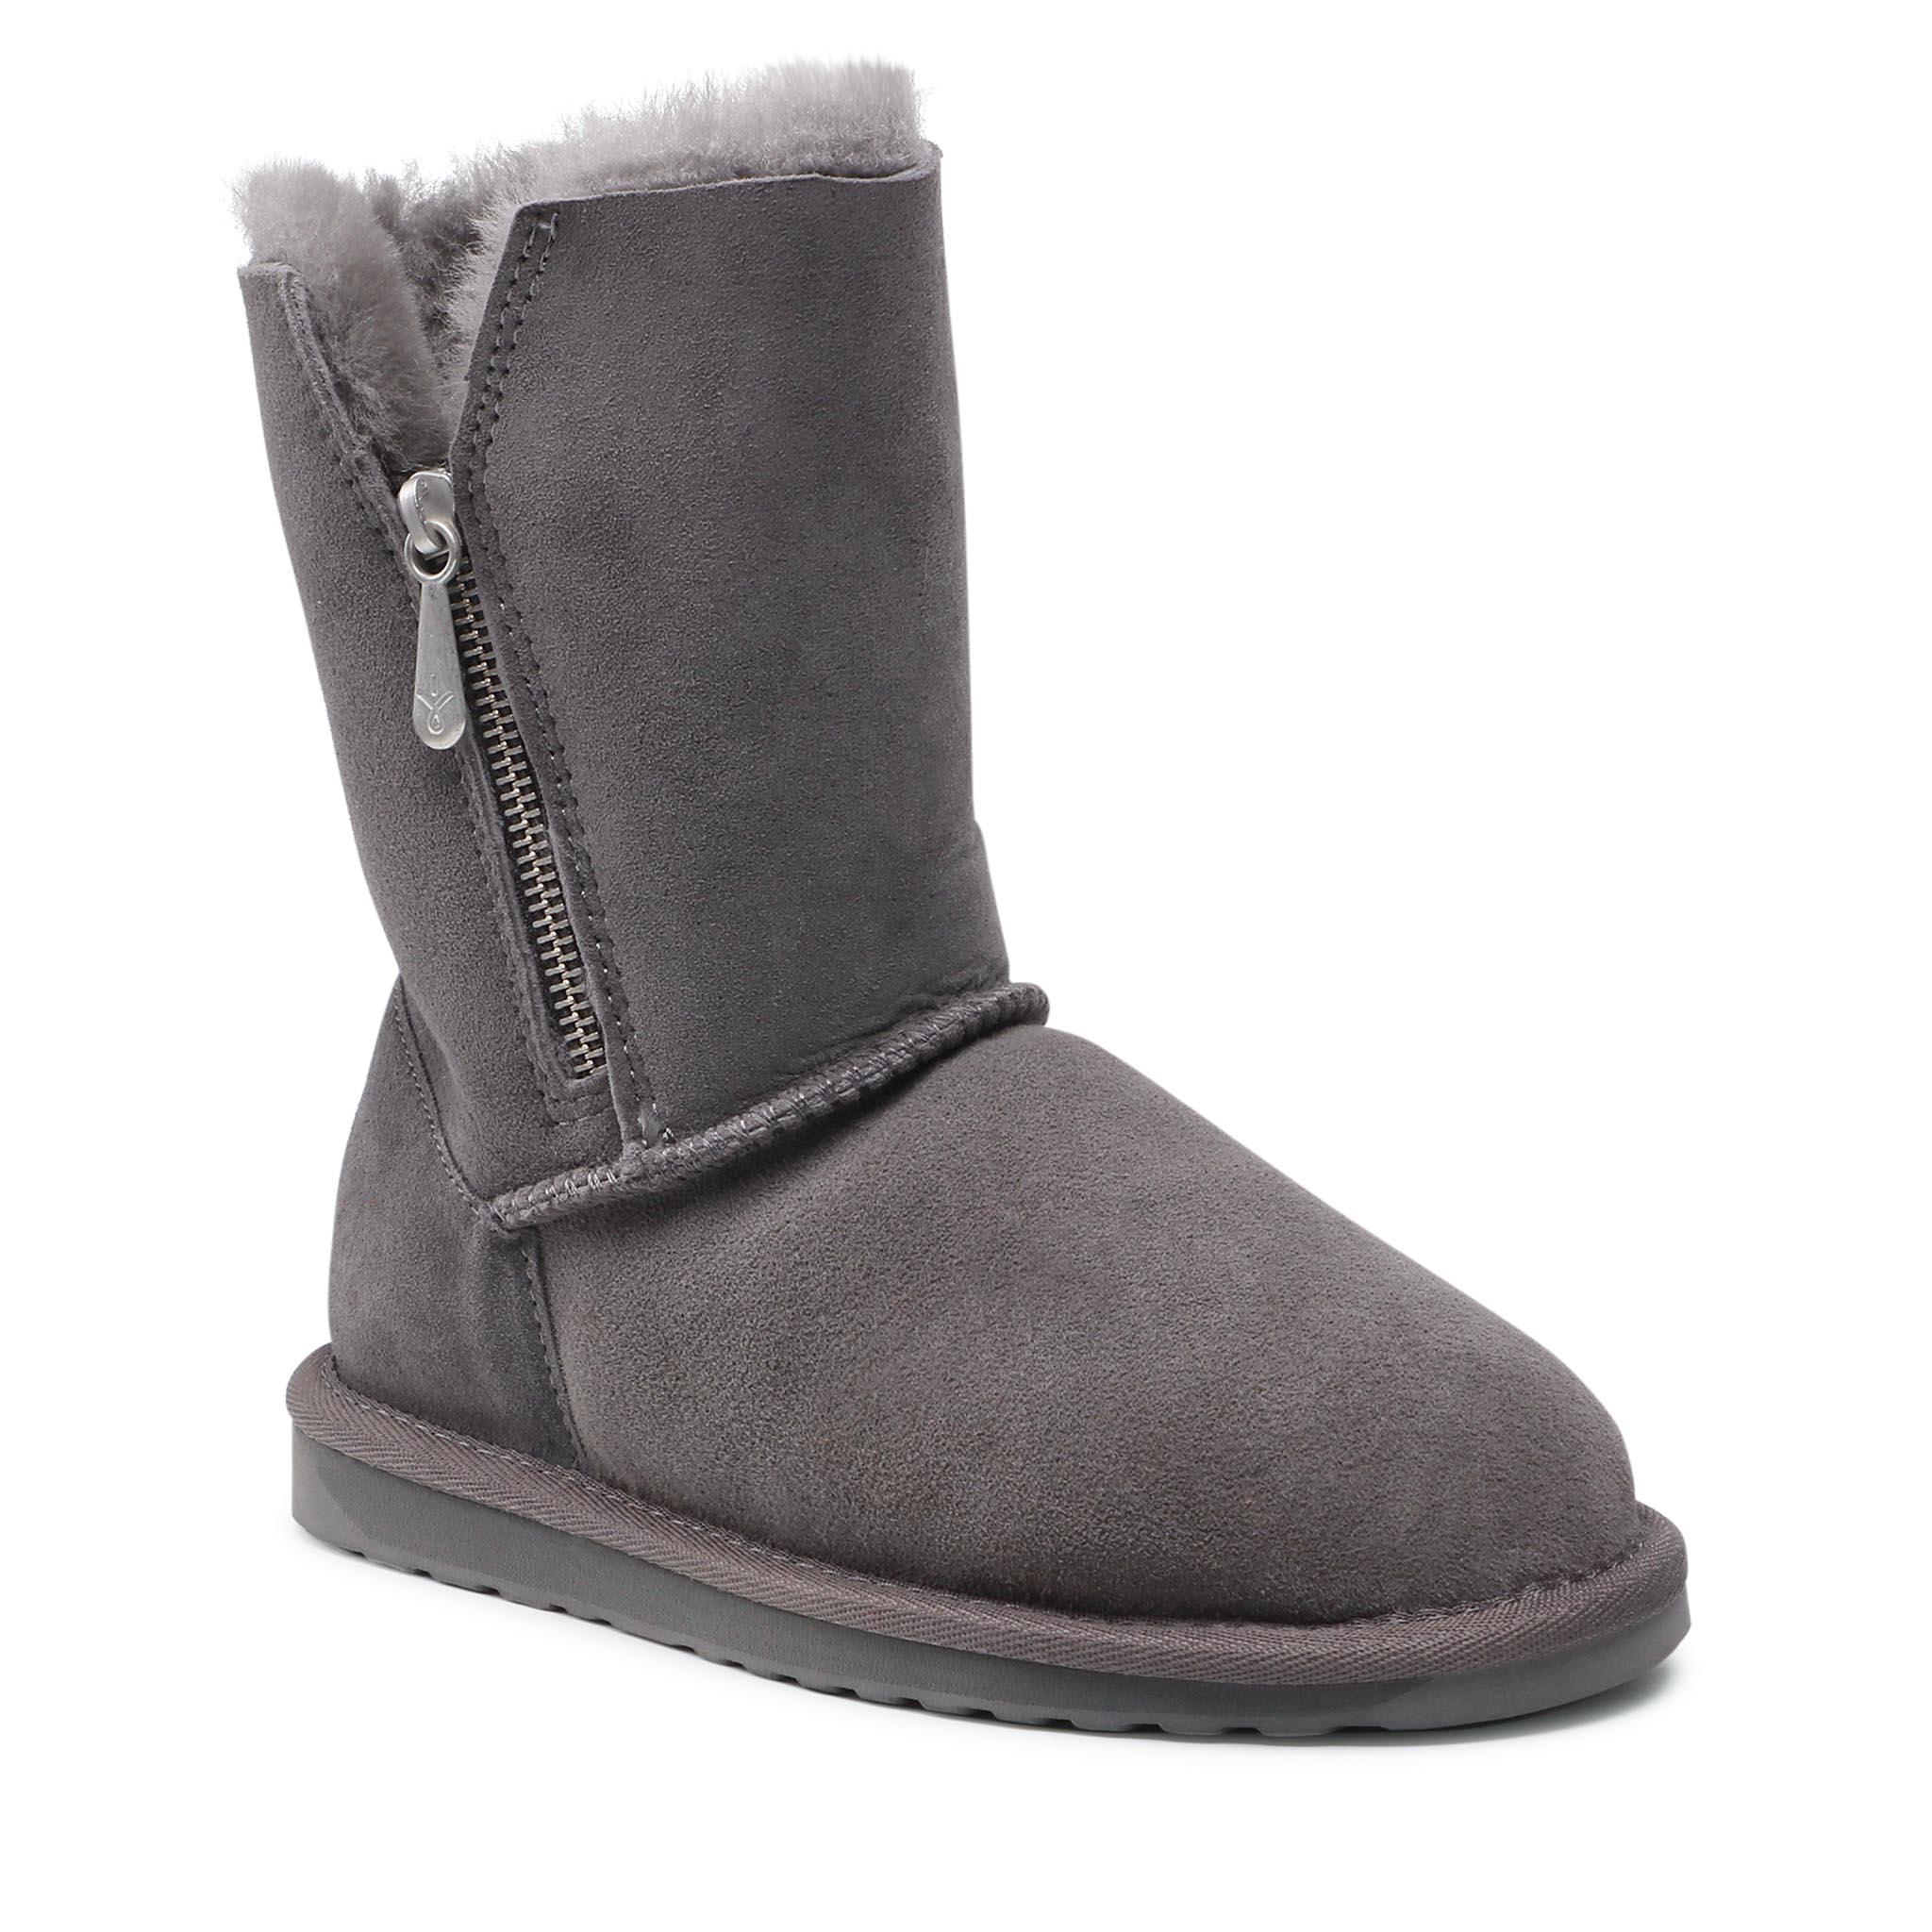 Image of Schuhe EMU AUSTRALIA - Ankaa W12615 Charcoal